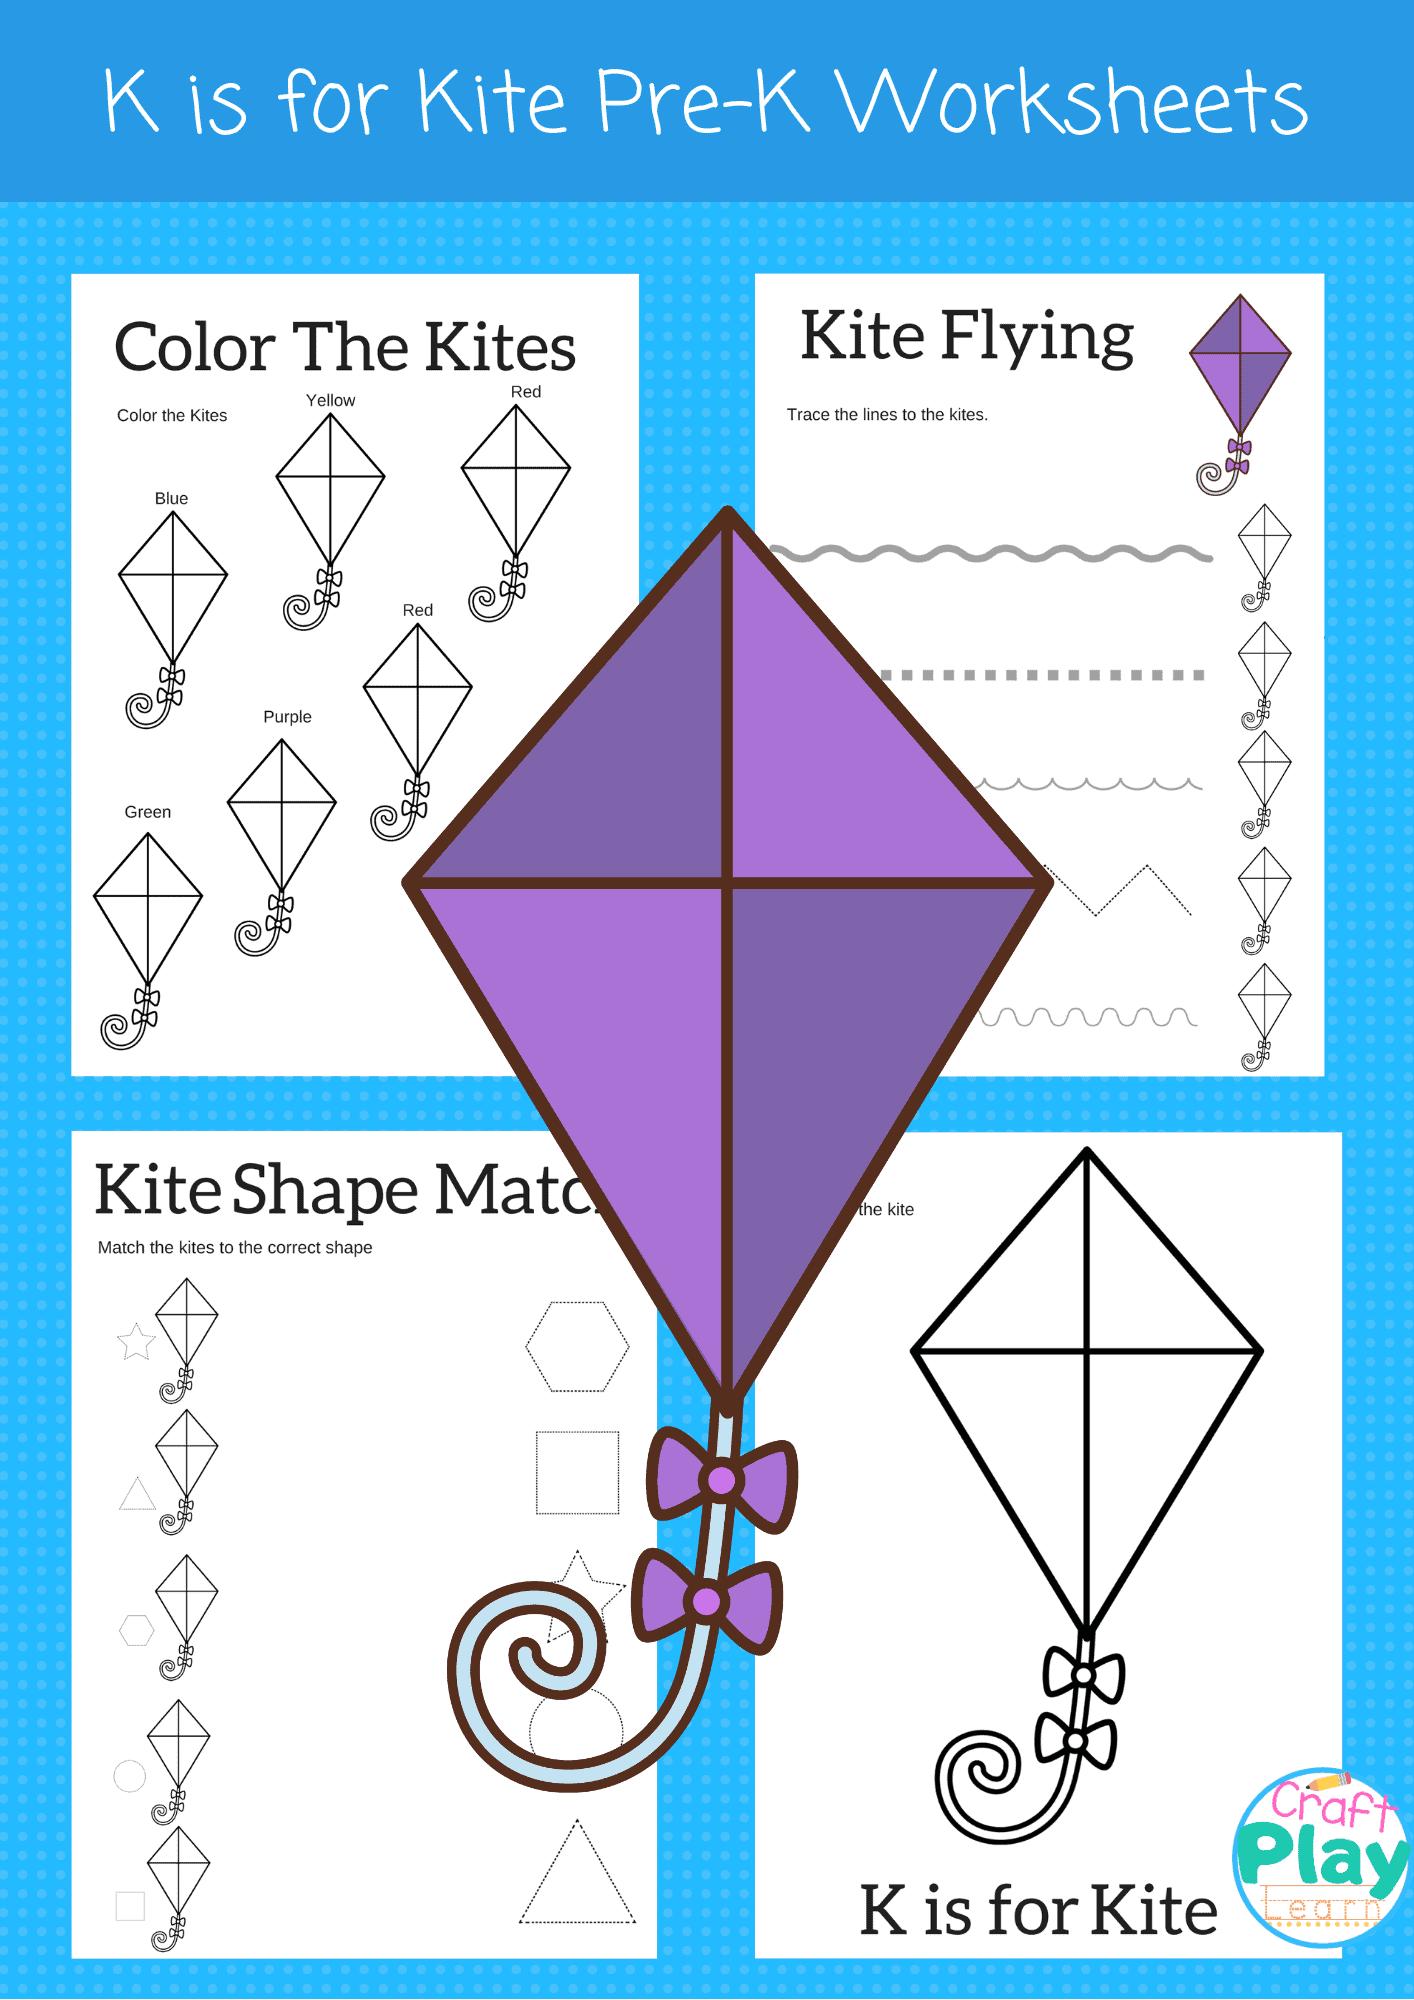 Letter K Worksheets For Preschool Kids - Craft Play Learn